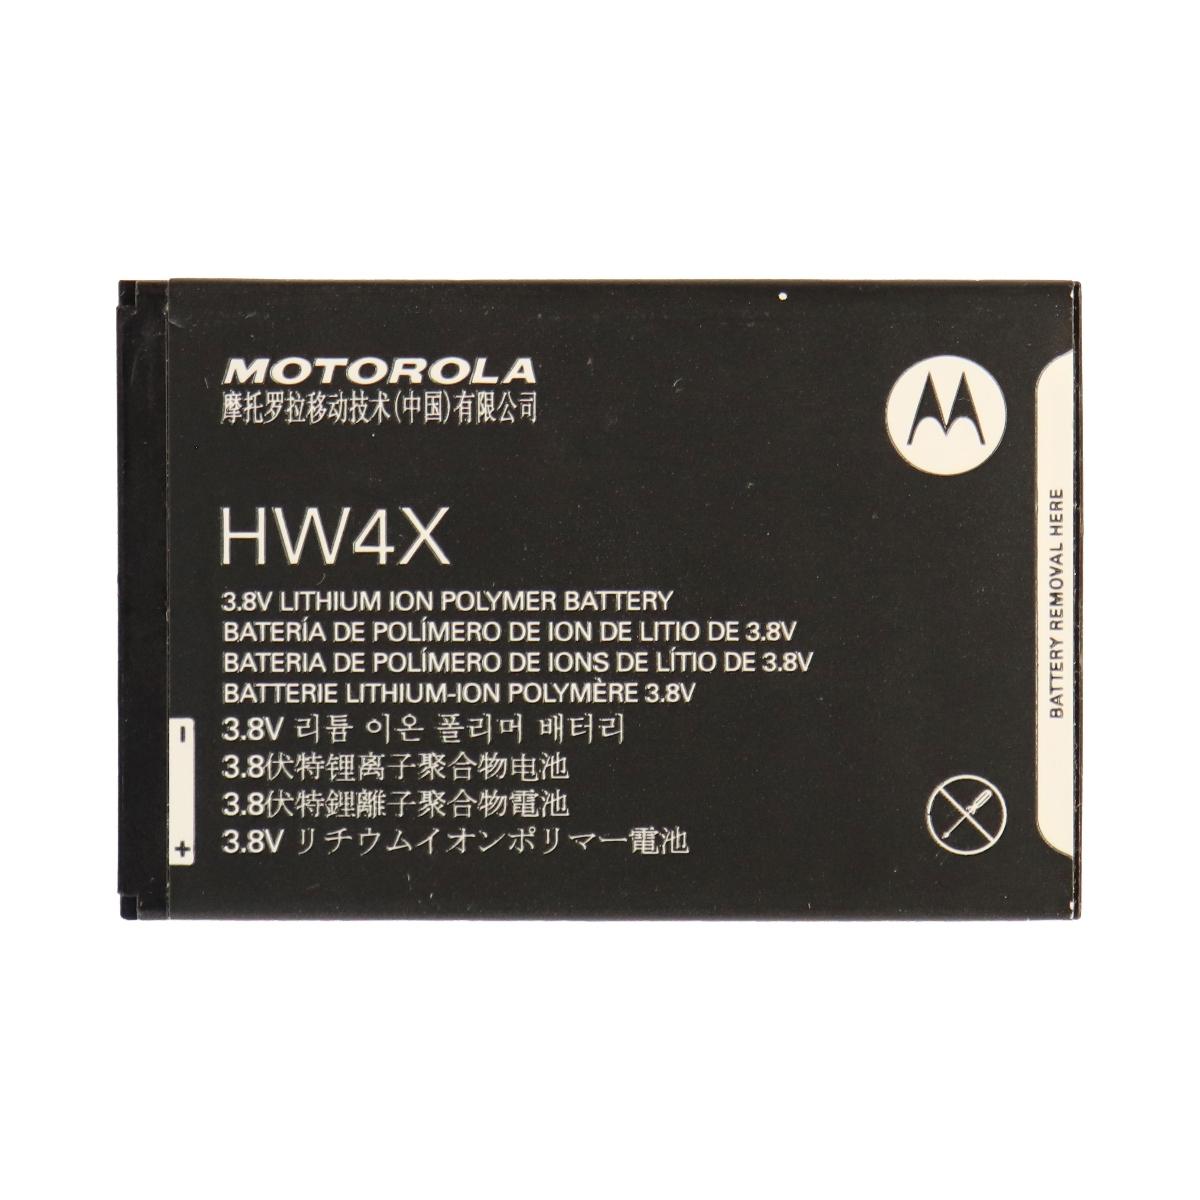 OEM Motorola HW4X /SN5892A 1735 mAh Replacement Battery for Droid Bionic